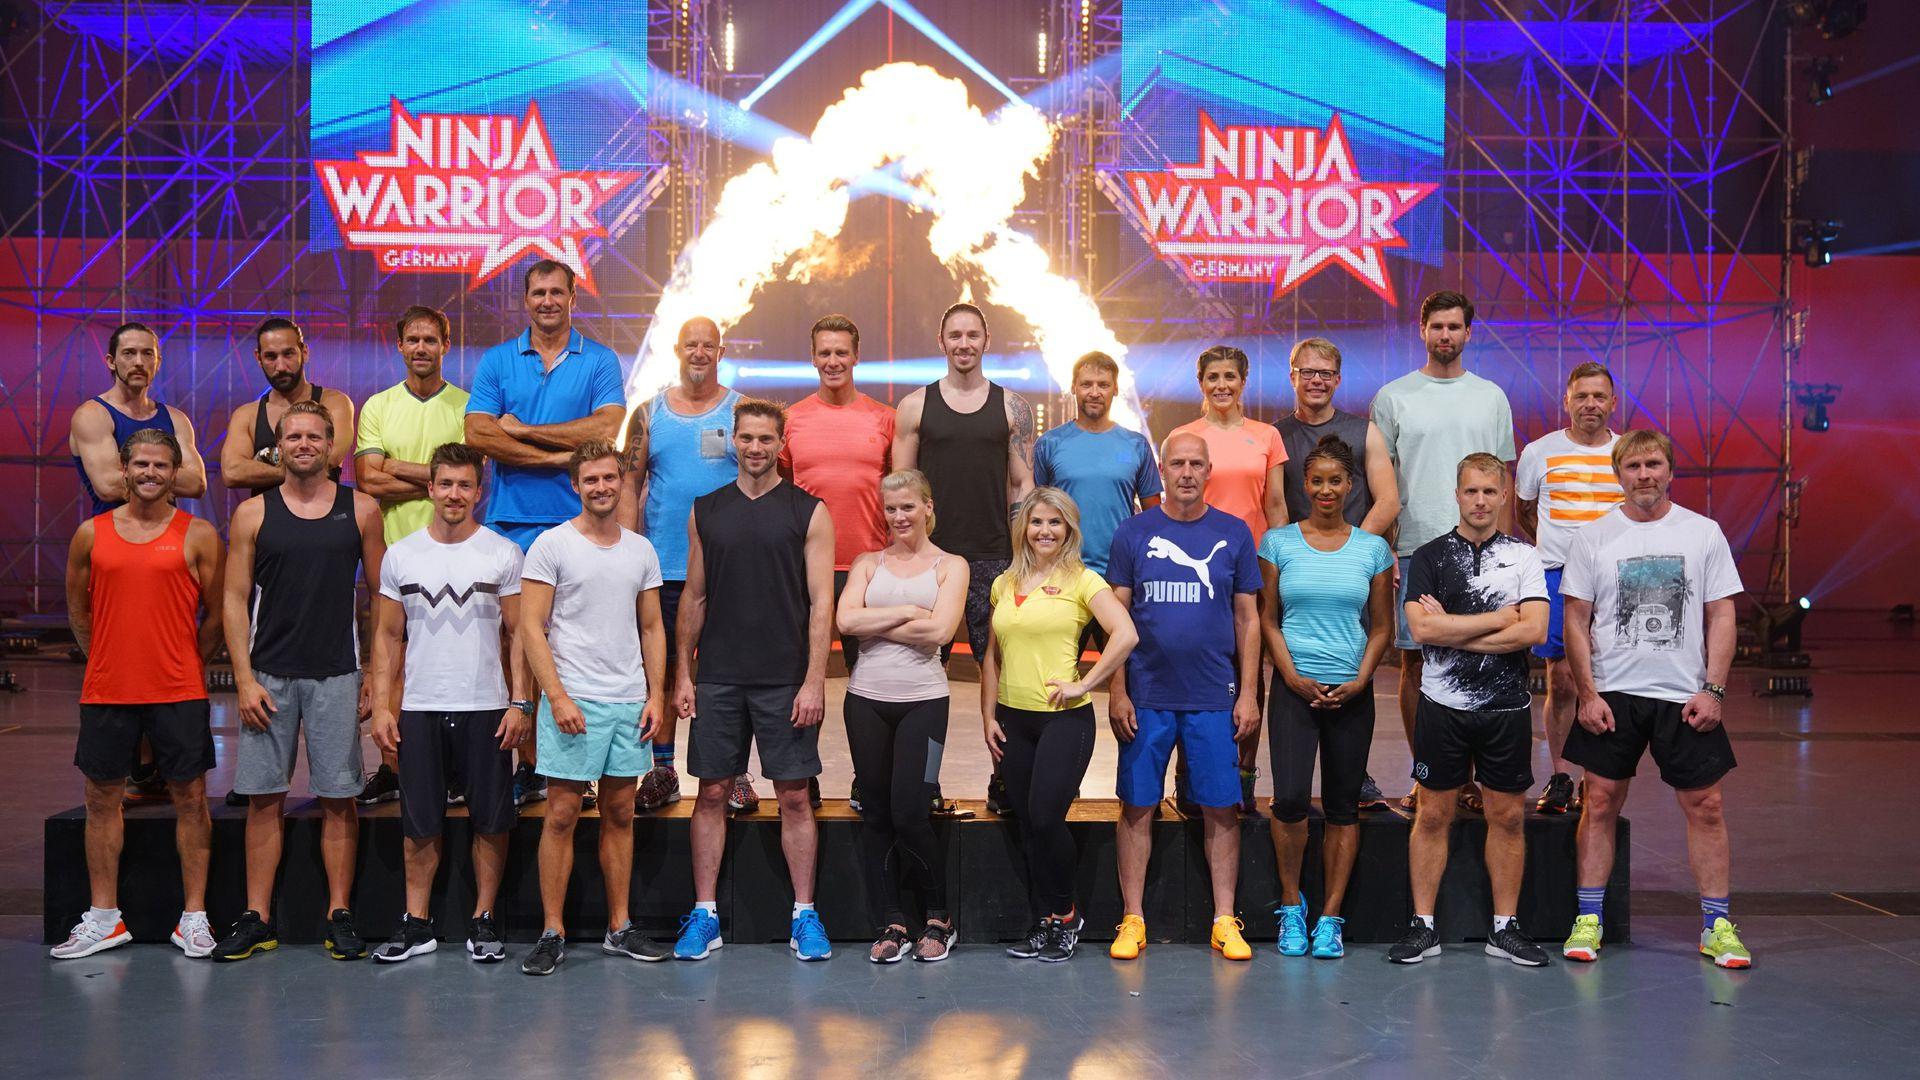 Promi Ninja Warrior 2021 November